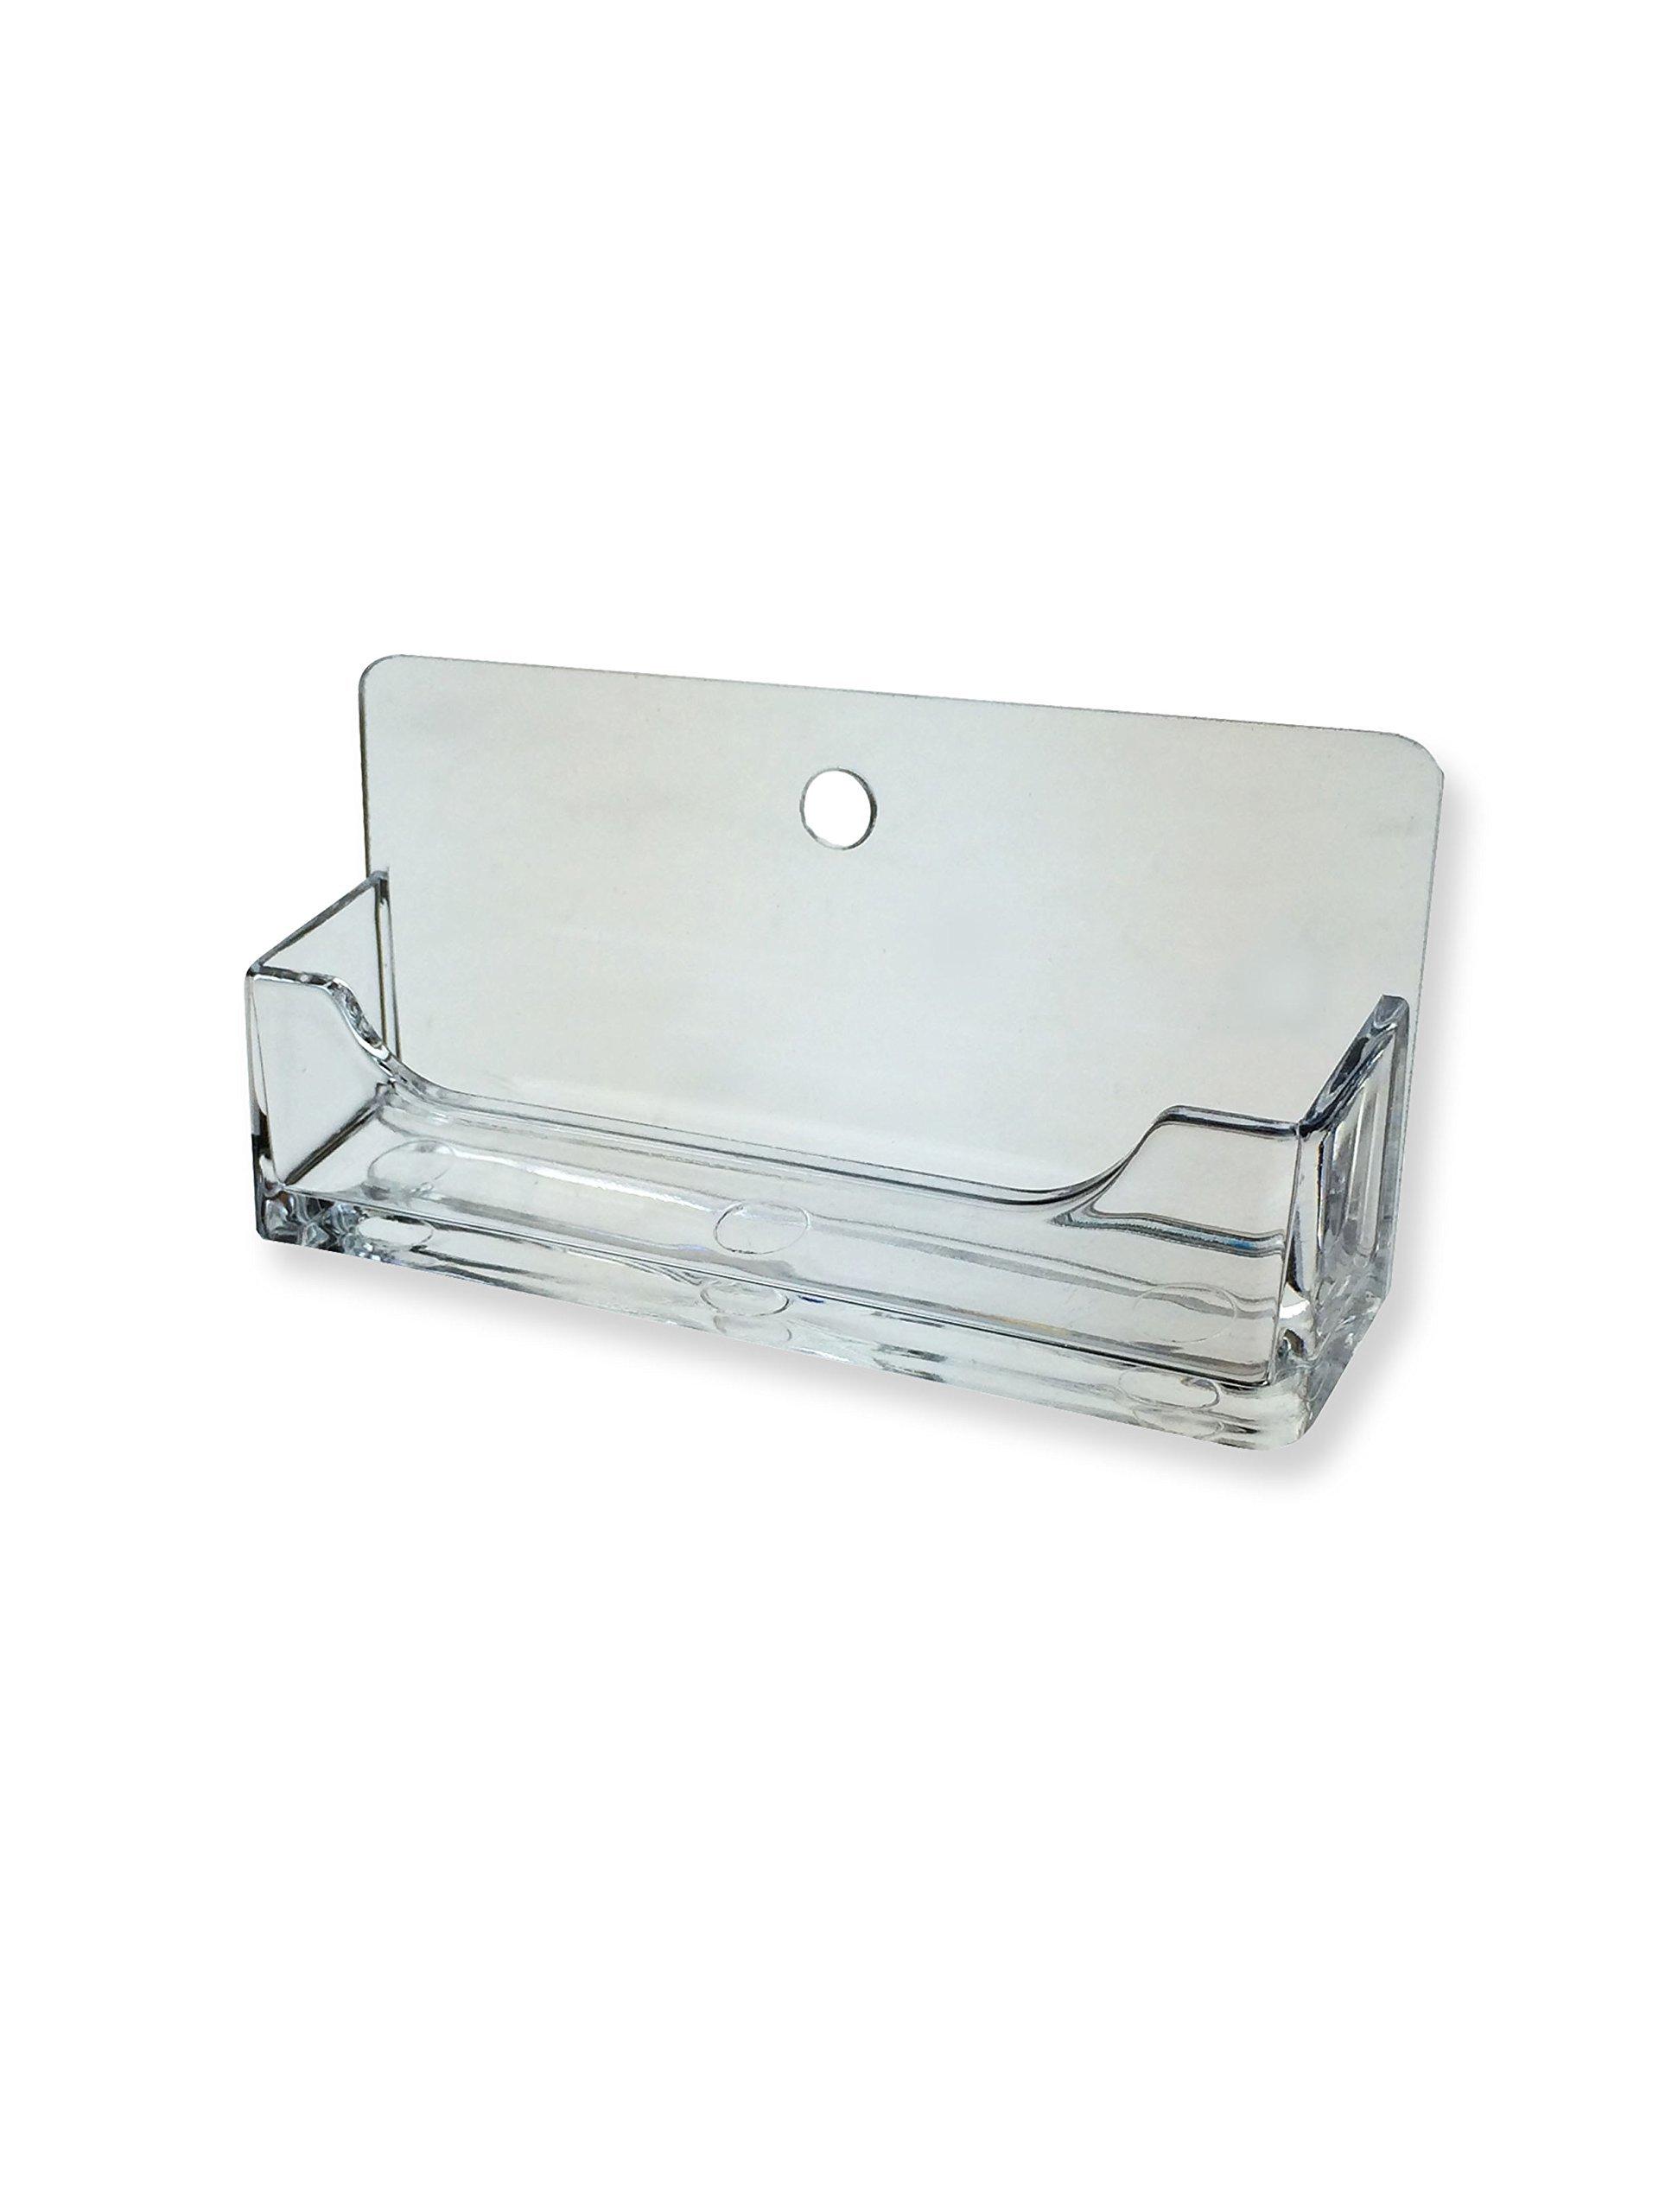 Marketing Holders Single Wall Business Card Display Rack Premium Acrylic Qty 1